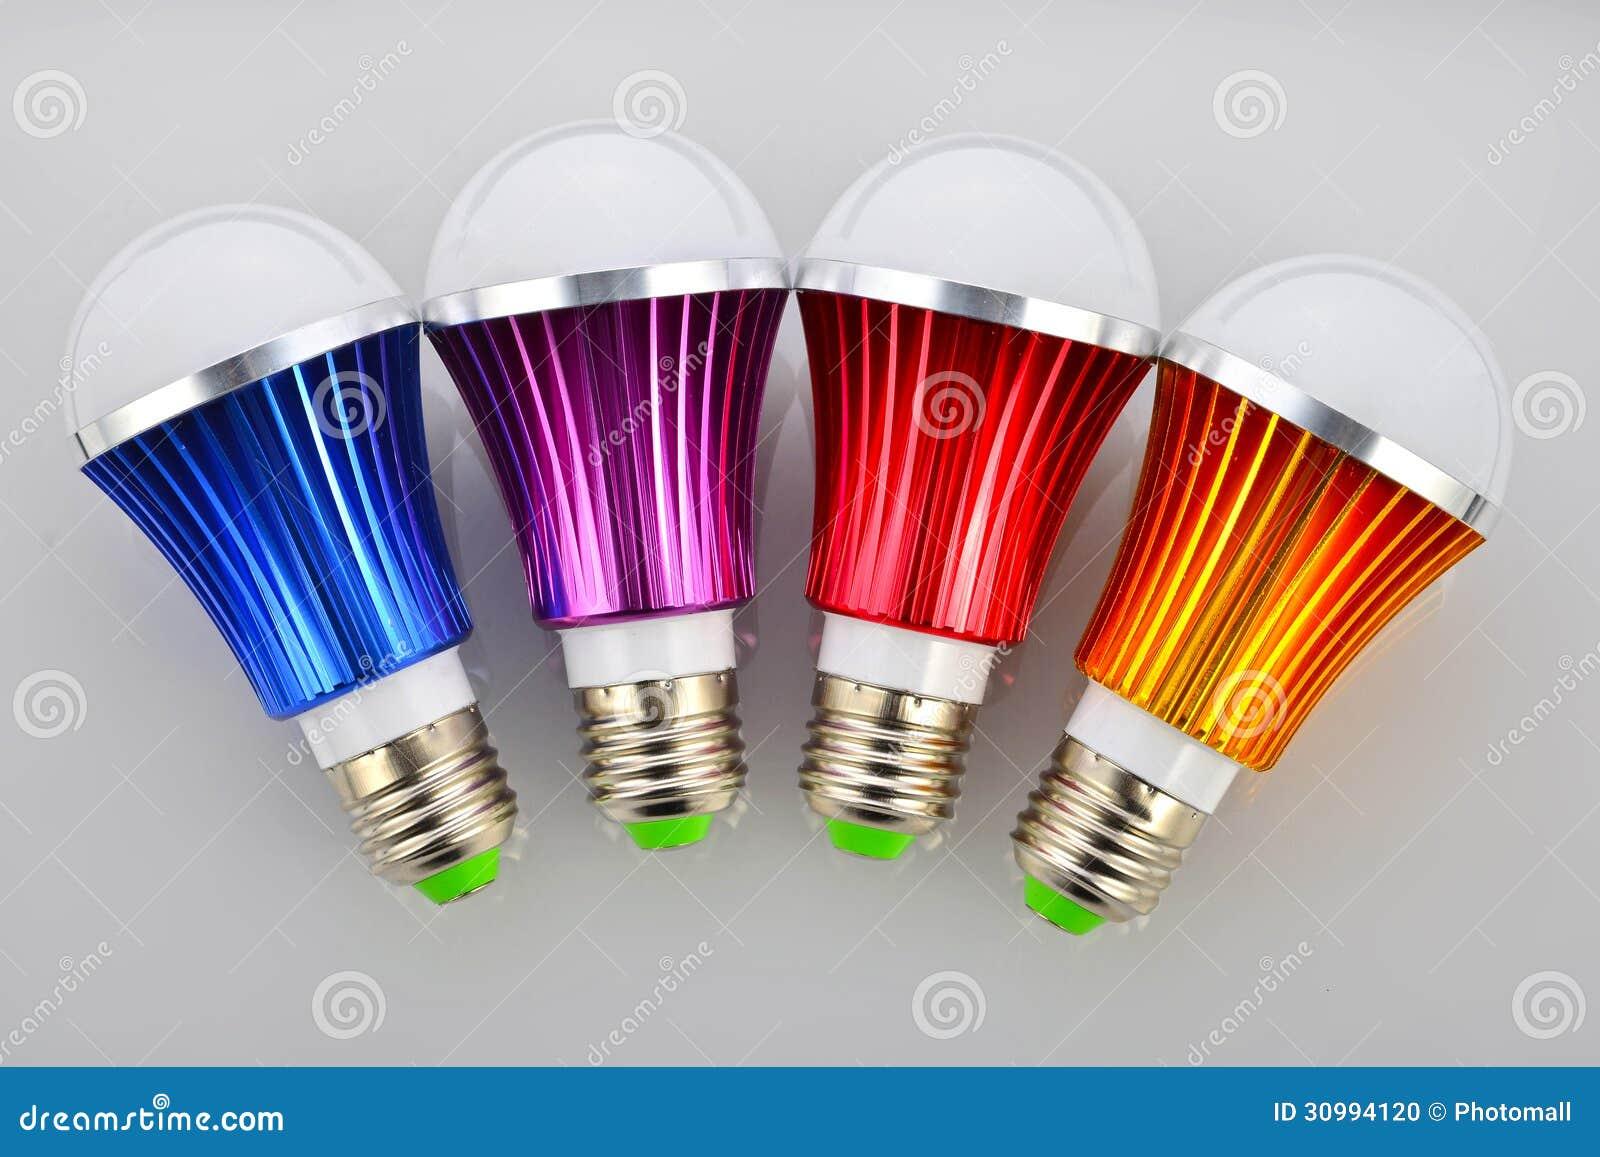 led light bulbs led lamp bulb green light source green lighting. Black Bedroom Furniture Sets. Home Design Ideas